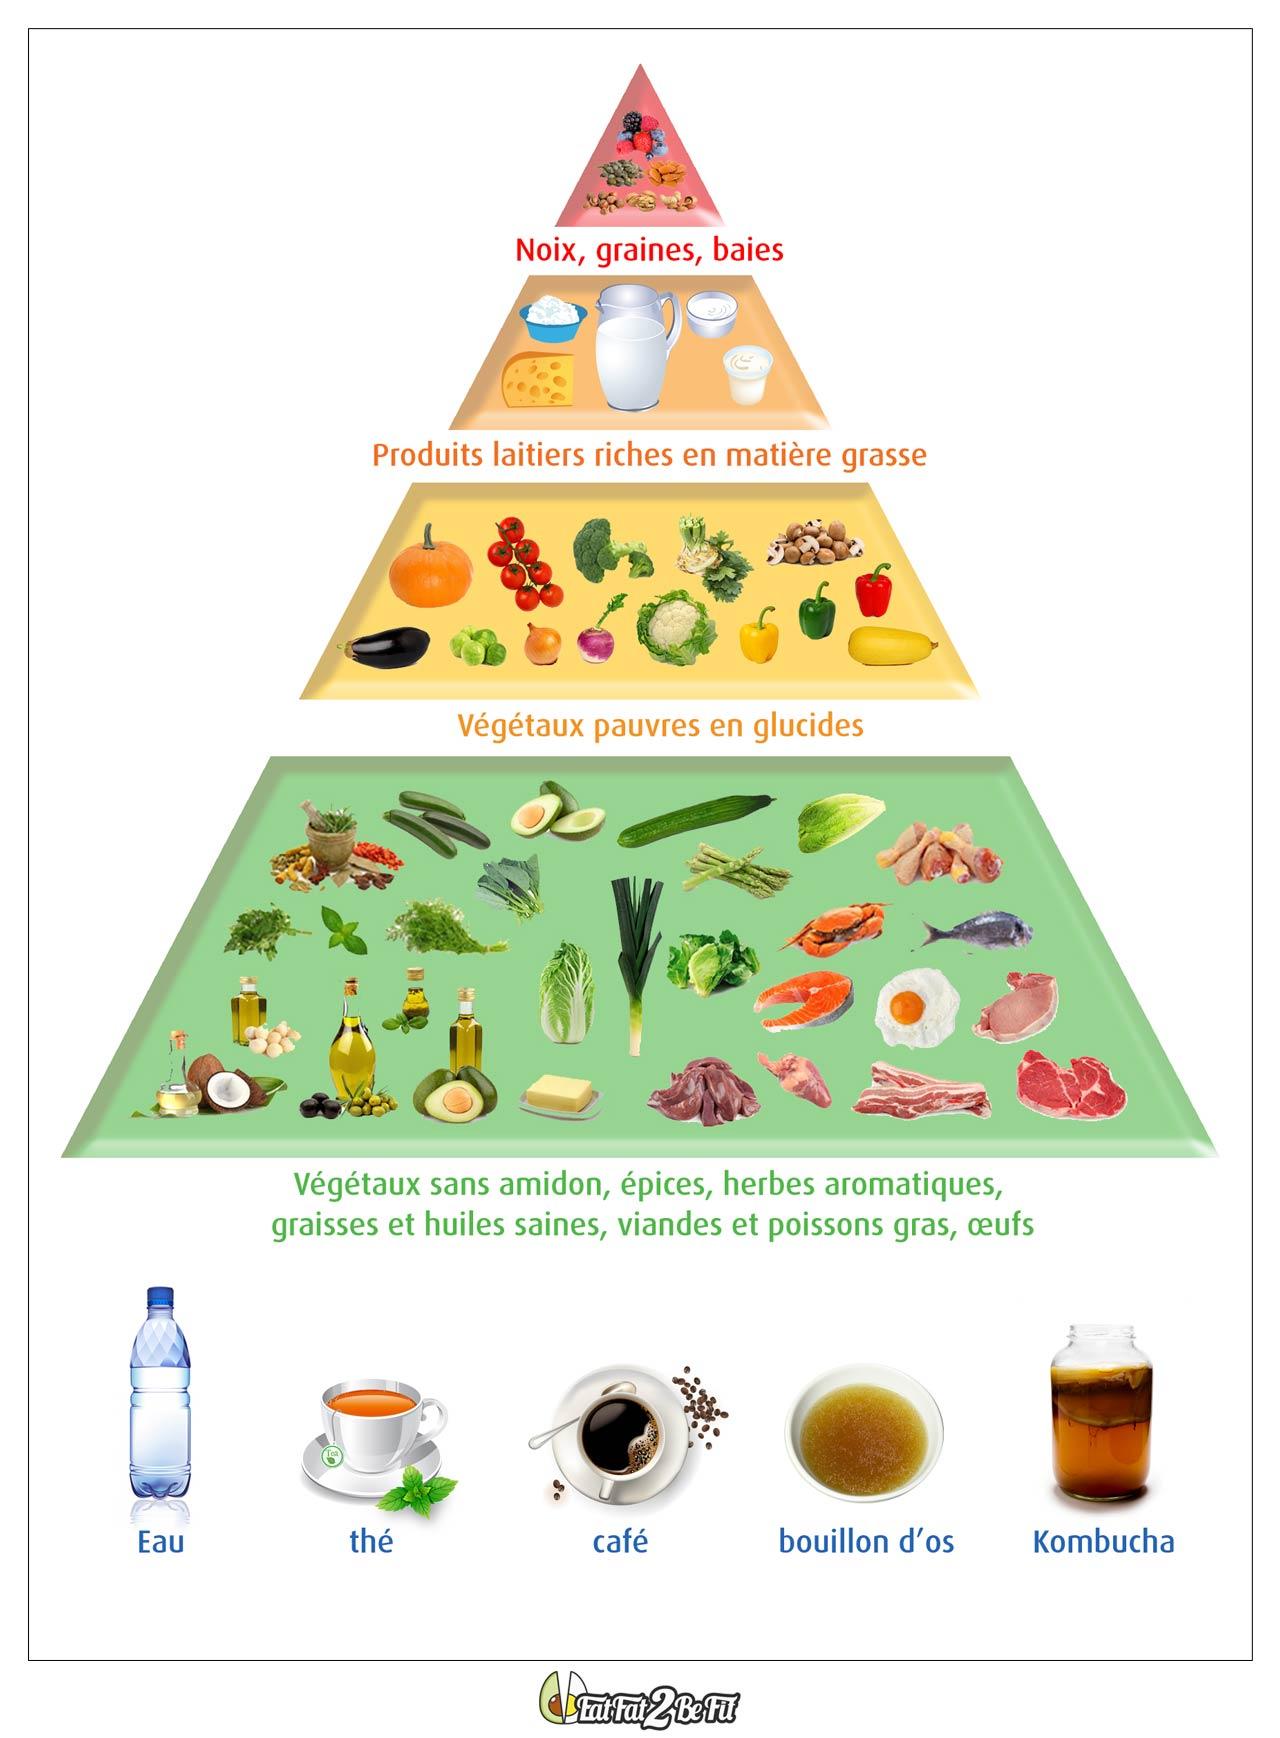 Topten Conseils pour Meilleures pilules de perte de poids ING